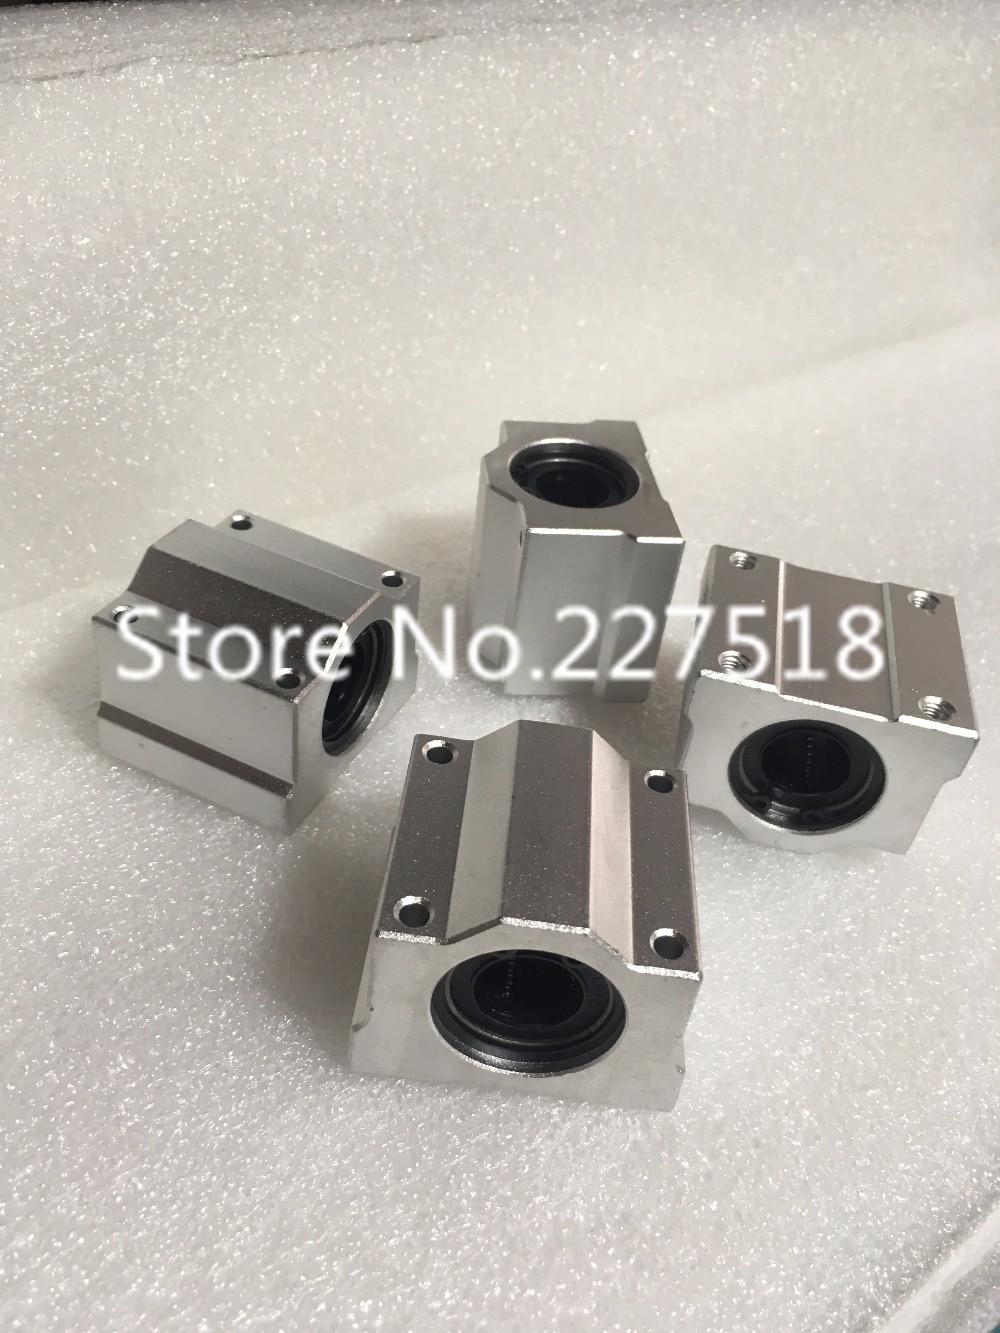 все цены на  1pcs SCS35UU 35mm linear guide Linear axis ball bearing block with LM35UU bush, pillow block linear unit for CNC part  онлайн